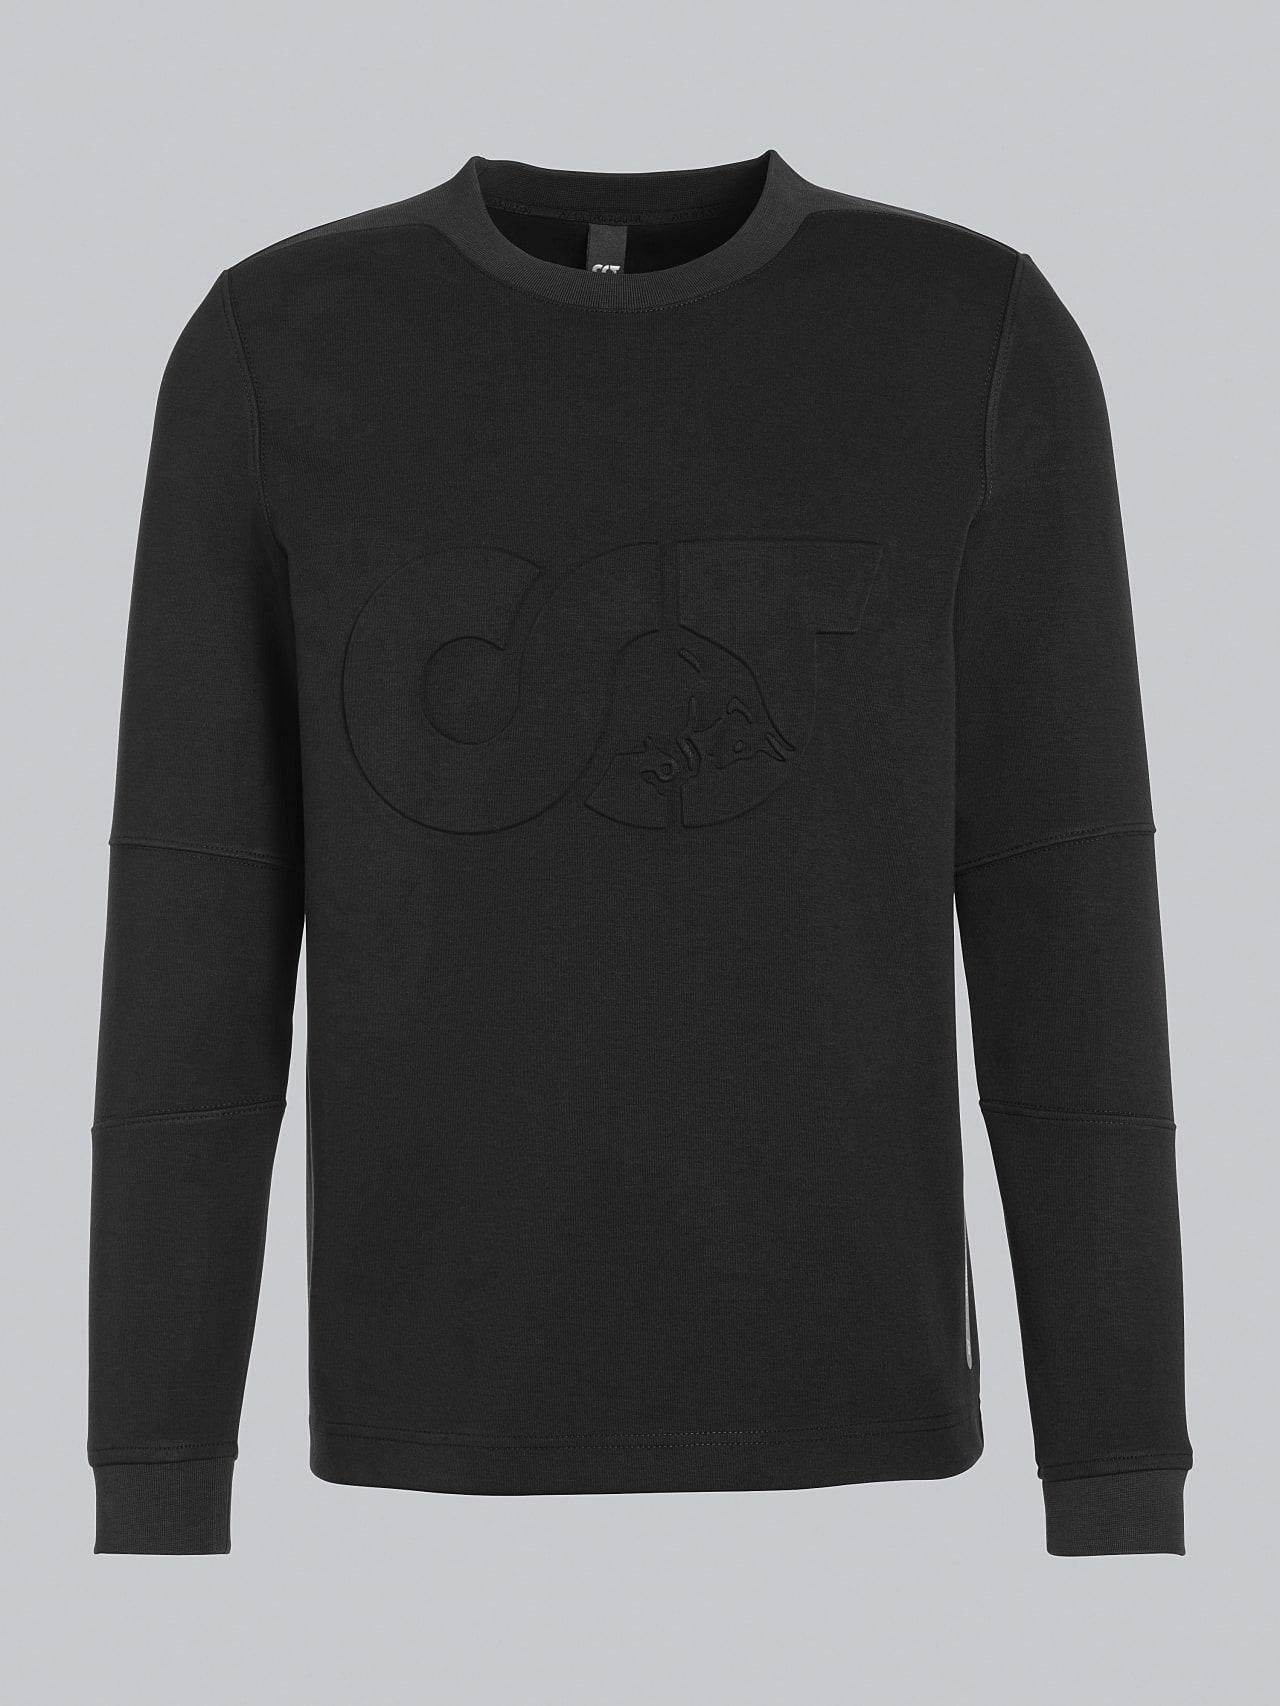 SCONA V1.Y5.02 Premium Sweatshirt black Back Alpha Tauri